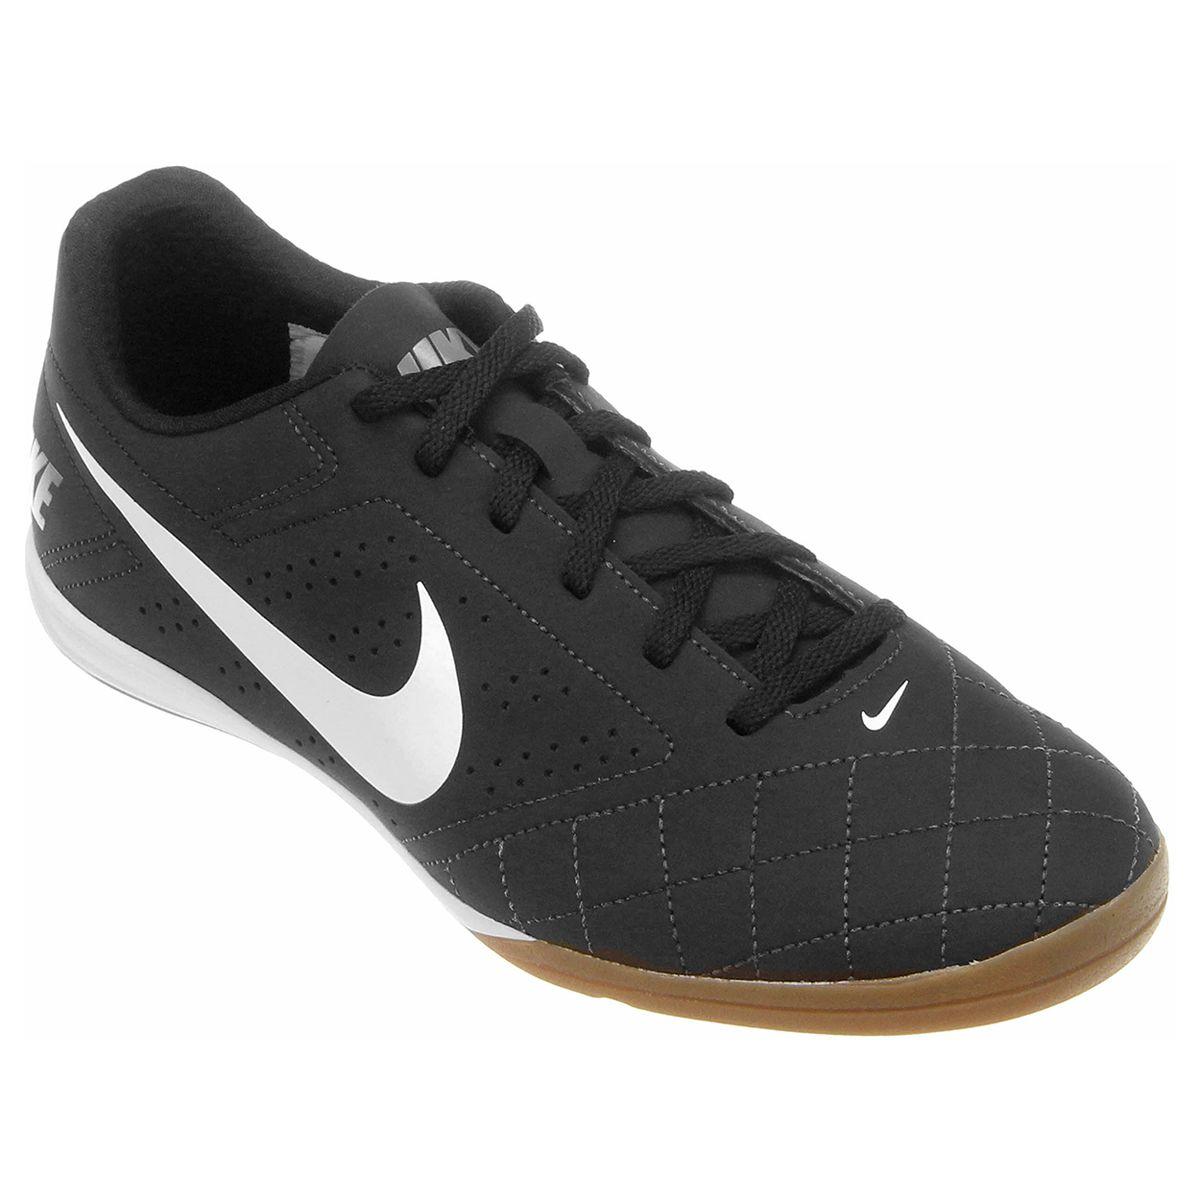 Tenis Nike Beco 2 Futsal  - Dozze Shoes